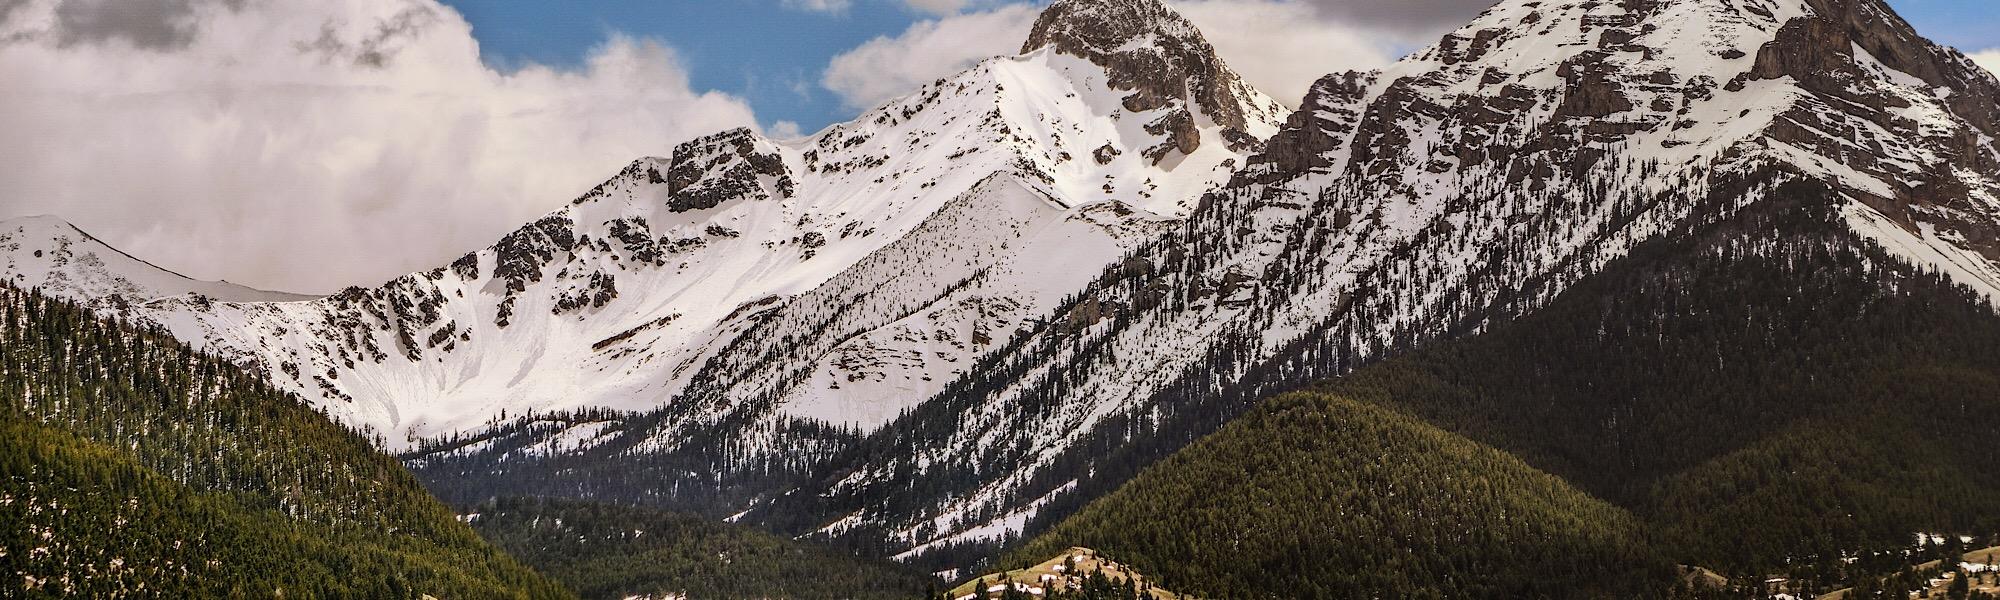 Bell Mountain from Bassinger Canyon. Matt Durrant Photo